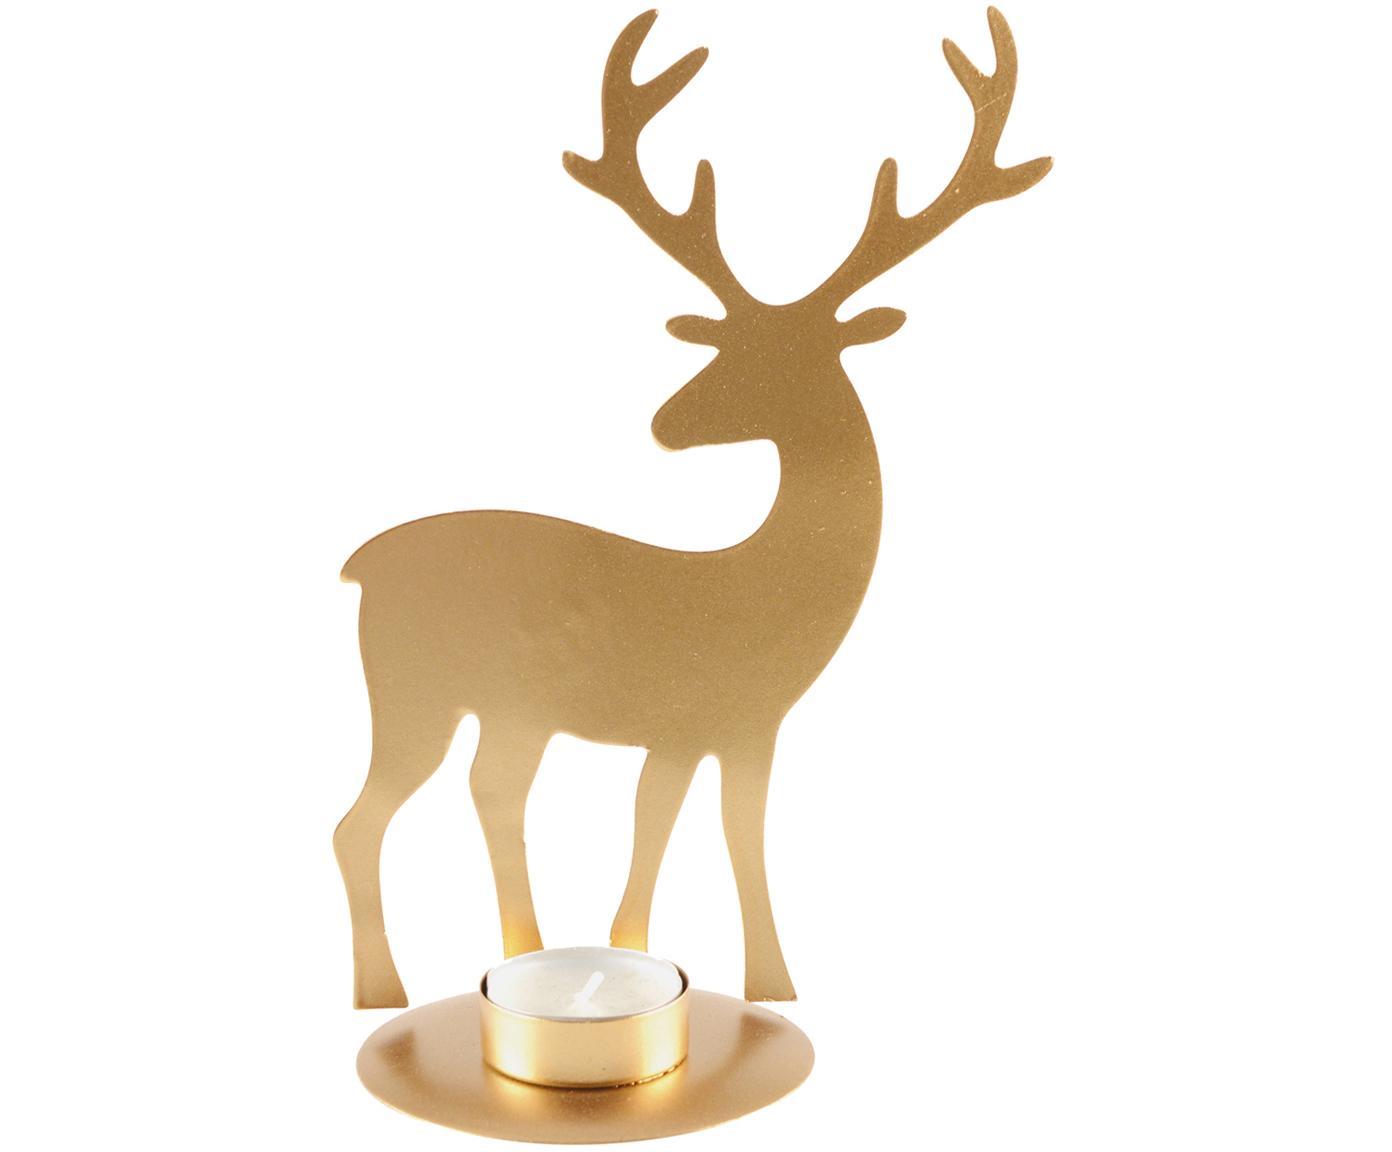 Portalumini Deer, Metallo rivestito, Dorato, Larg. 14 x Alt. 21 cm